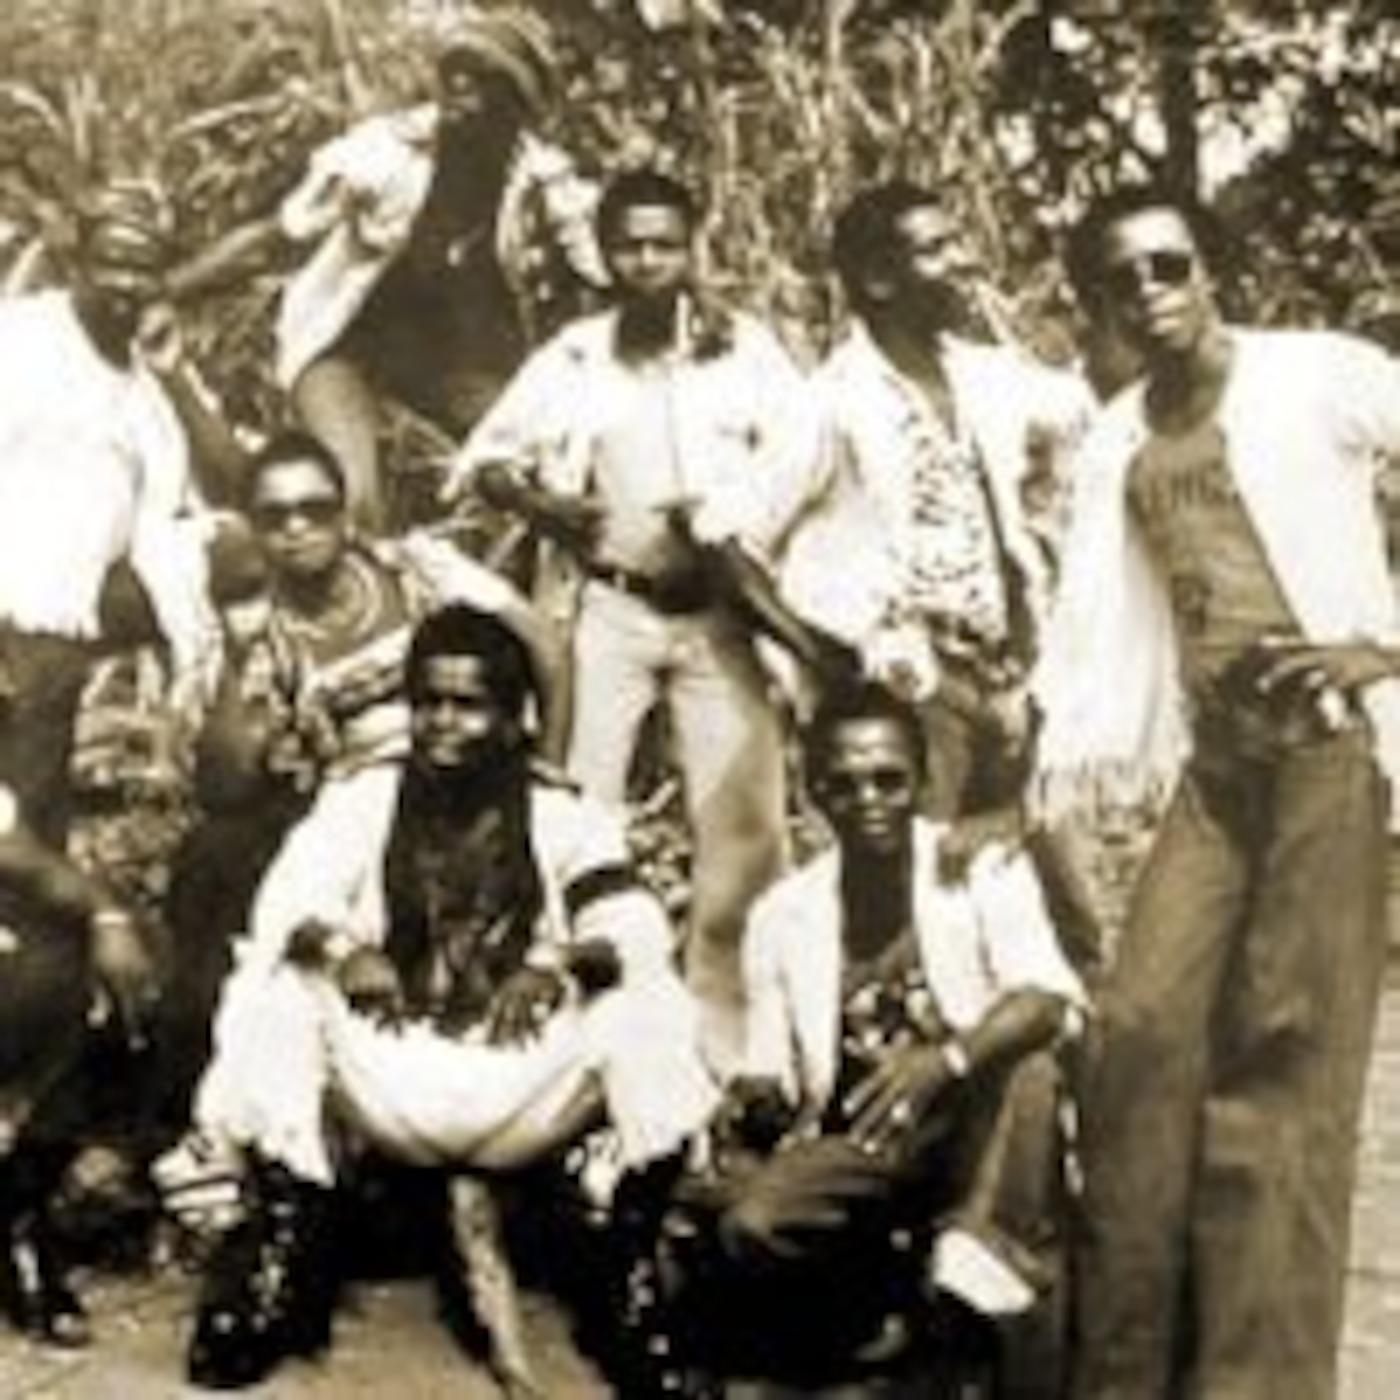 Dele Ojo & His Star Brothers Band - Enia Bi Aparo